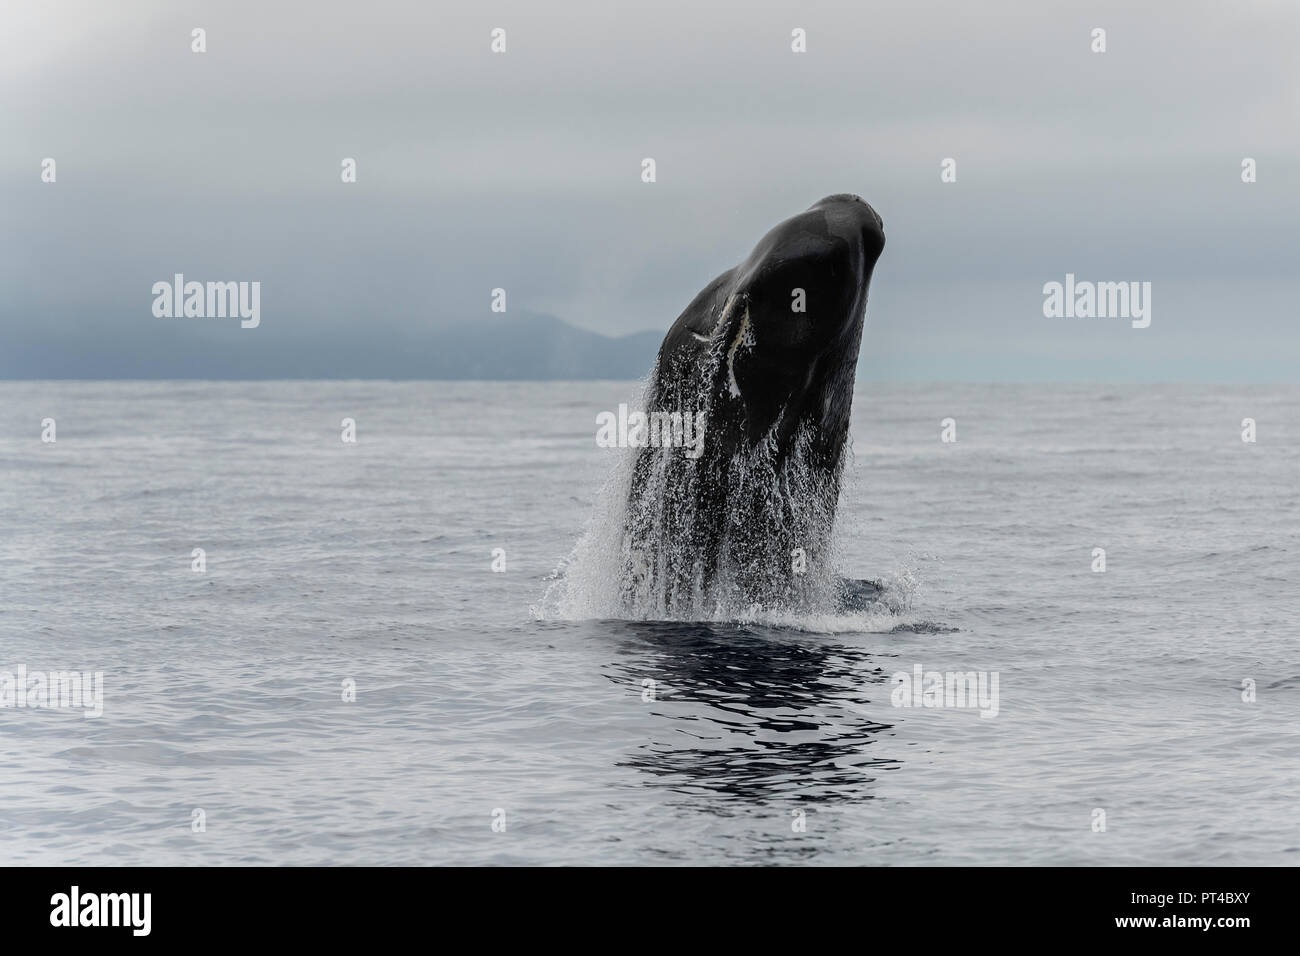 Breaching sperm whale, Pico Island, Azores. - Stock Image